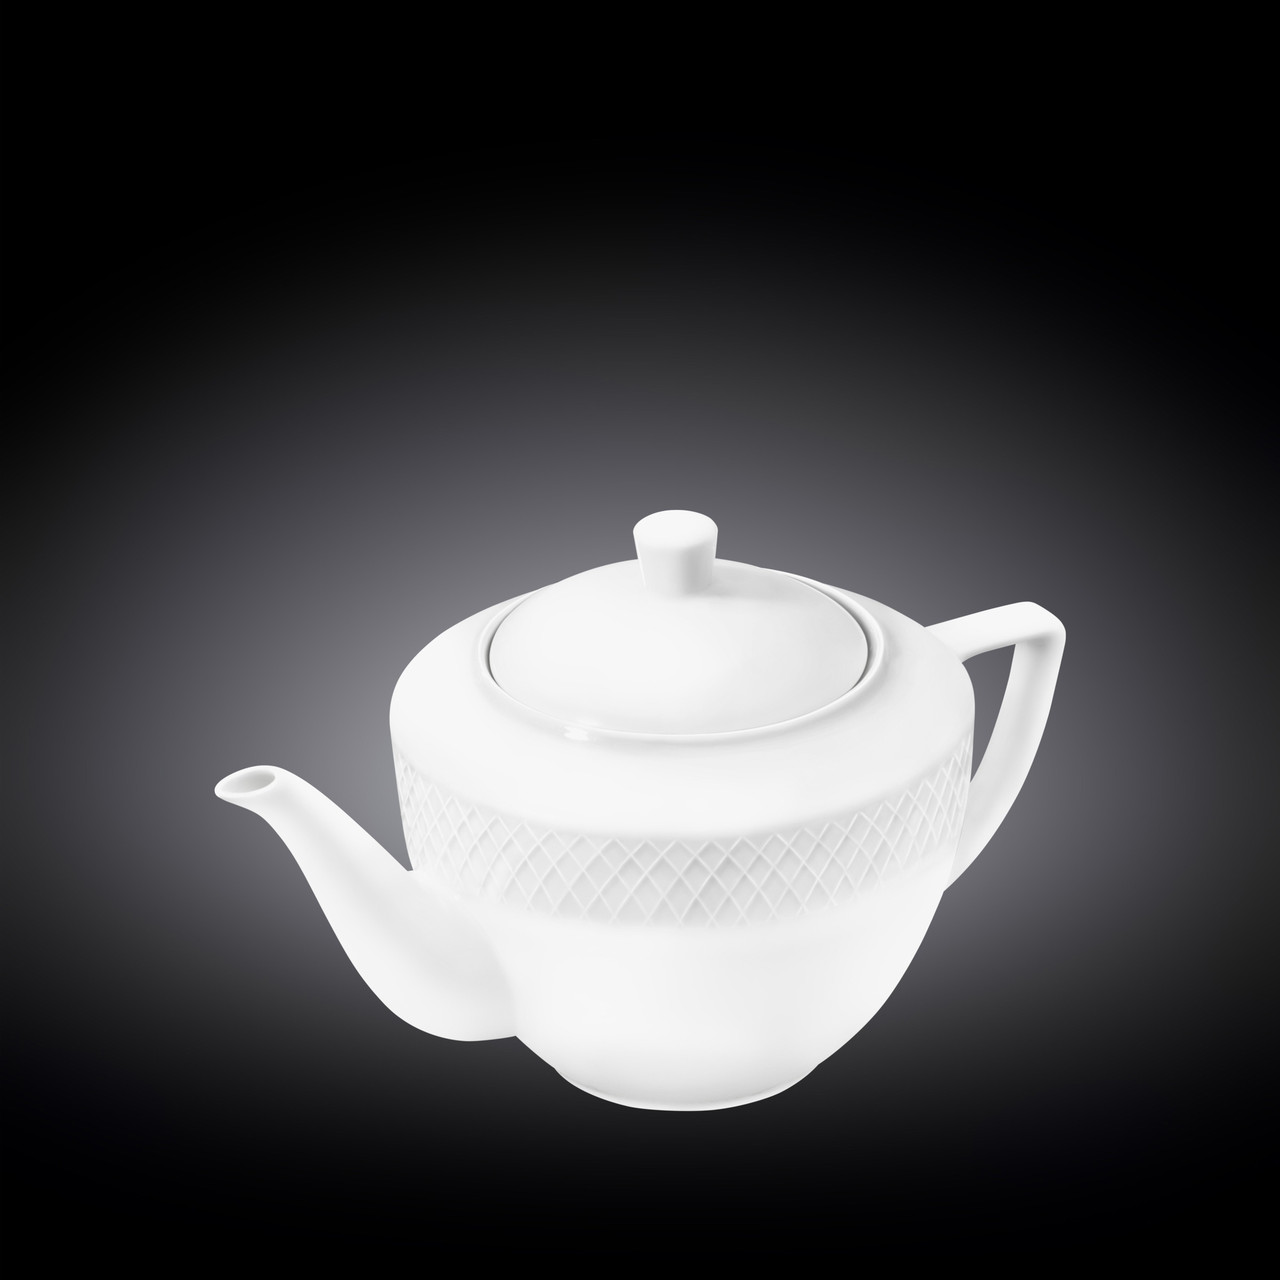 Заварочный чайник 900 мл Wilmax 880110/C